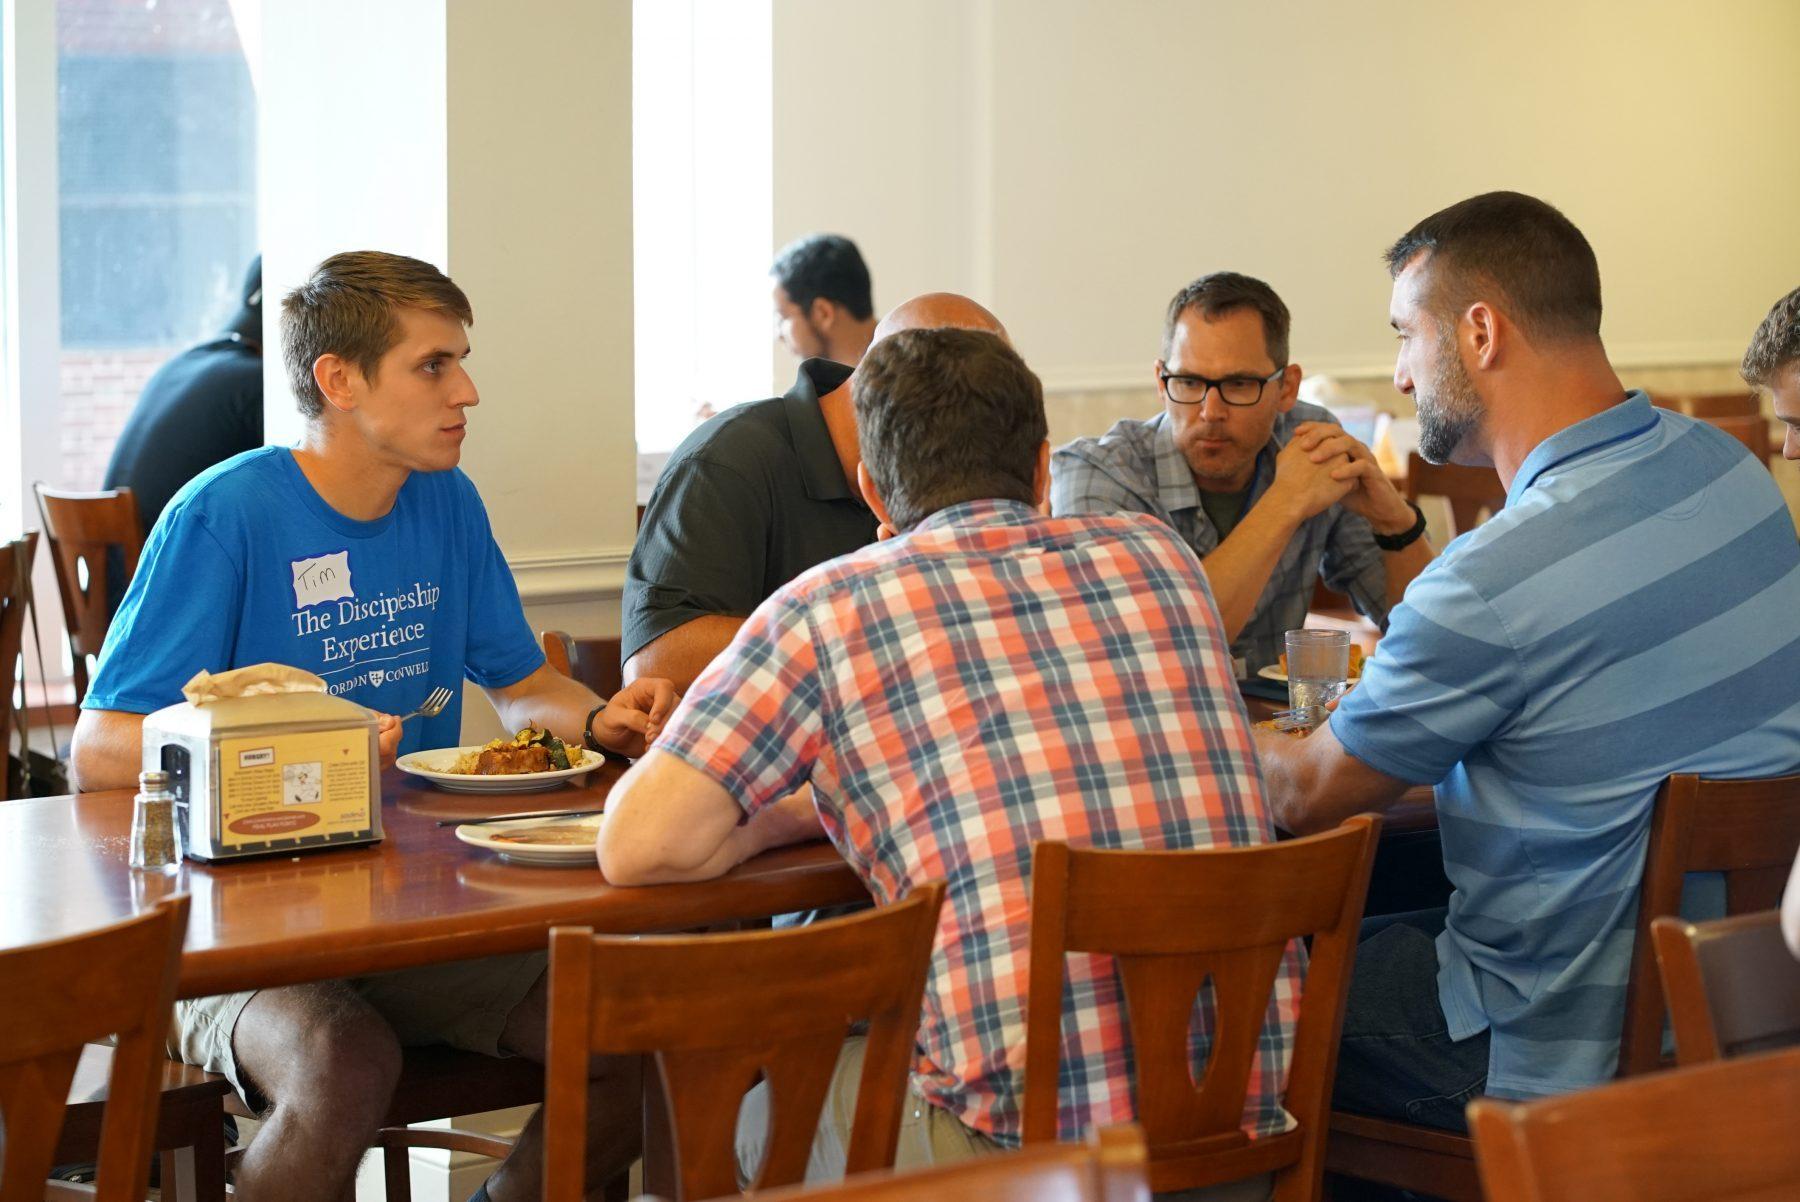 discipleship-experience